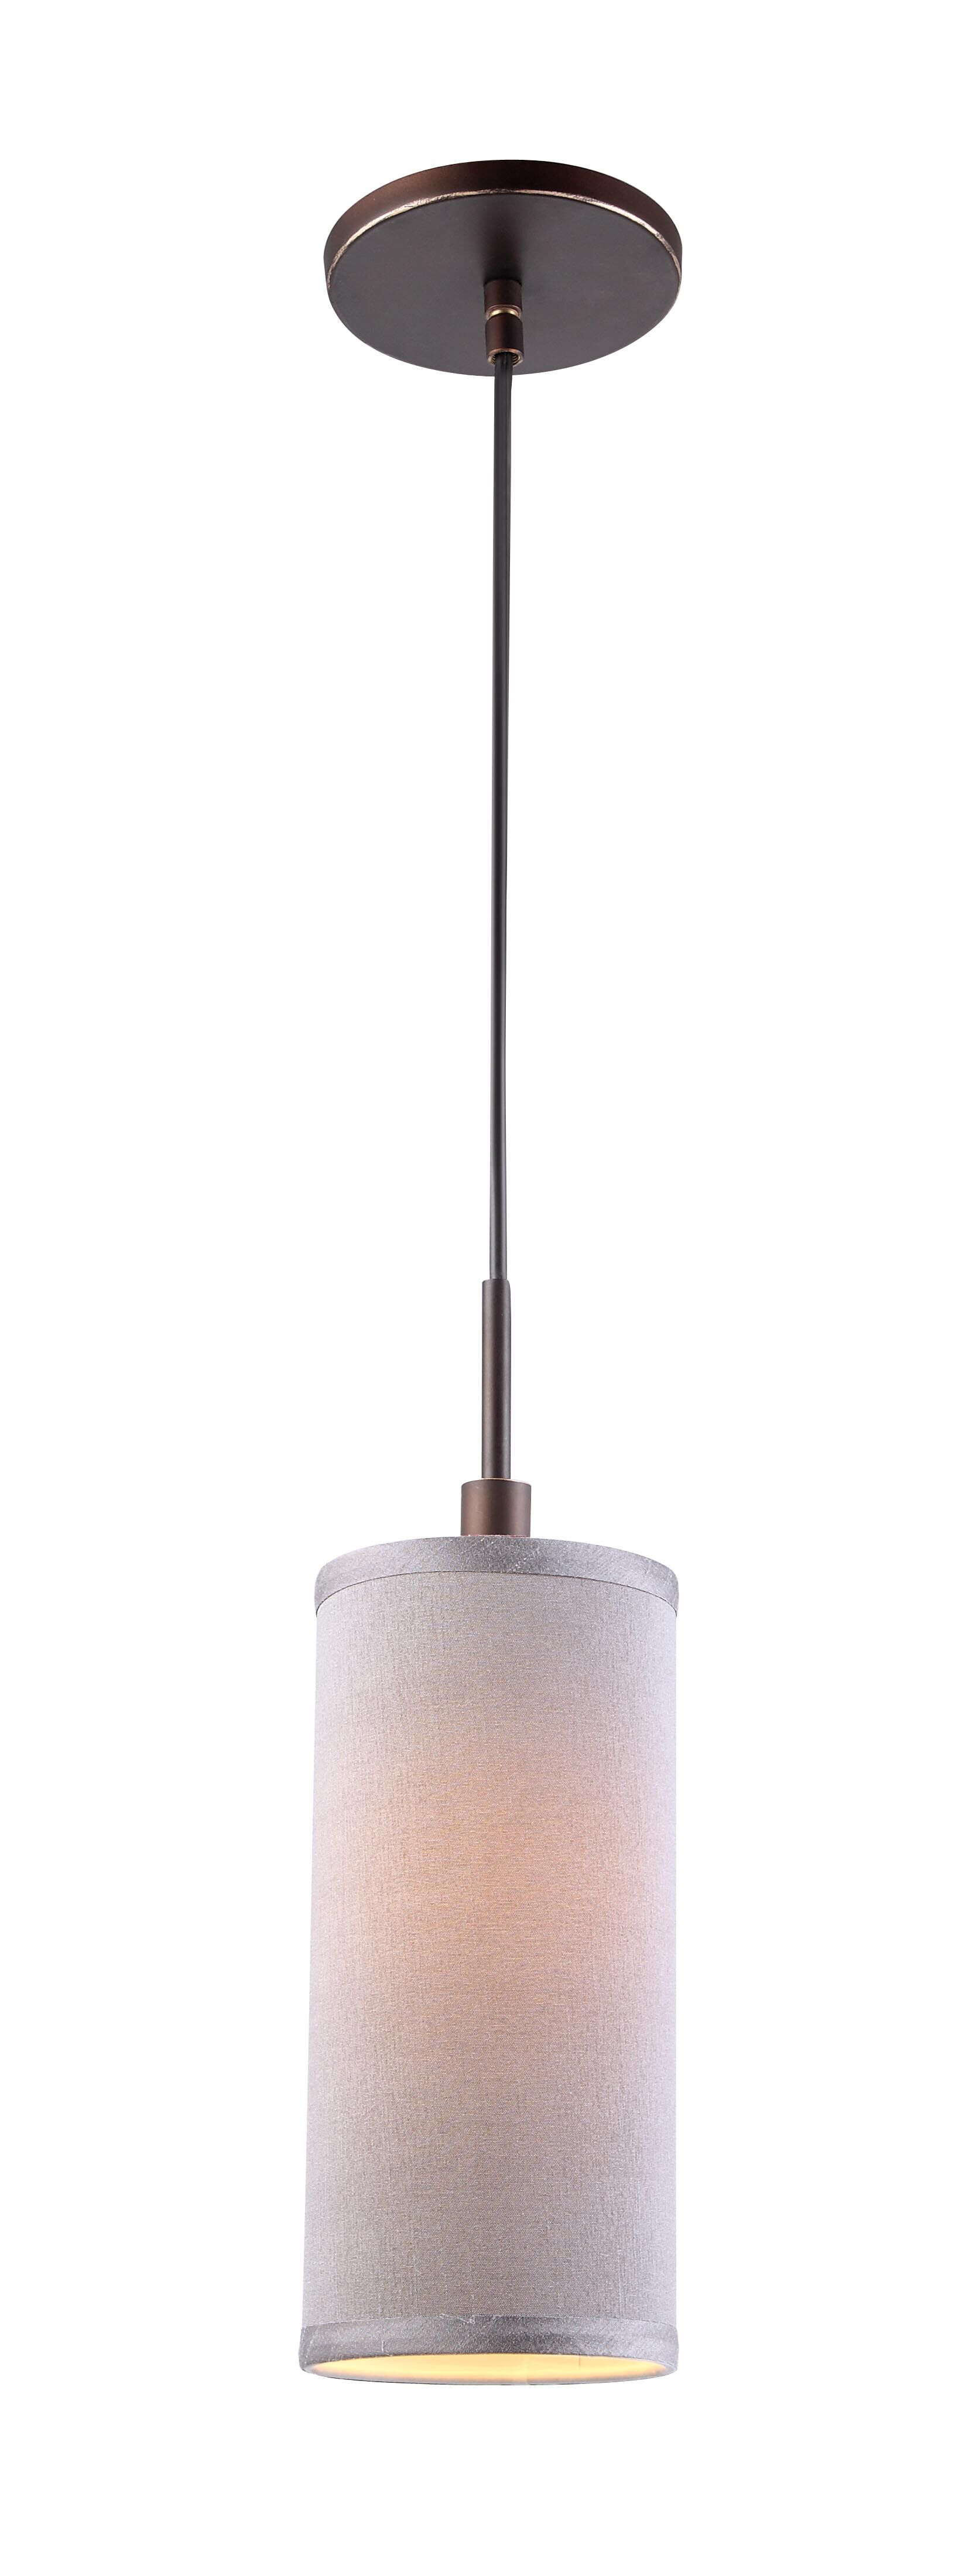 1-Light Cylinder Pendant Shade Color: Grey, Finish: Bronze